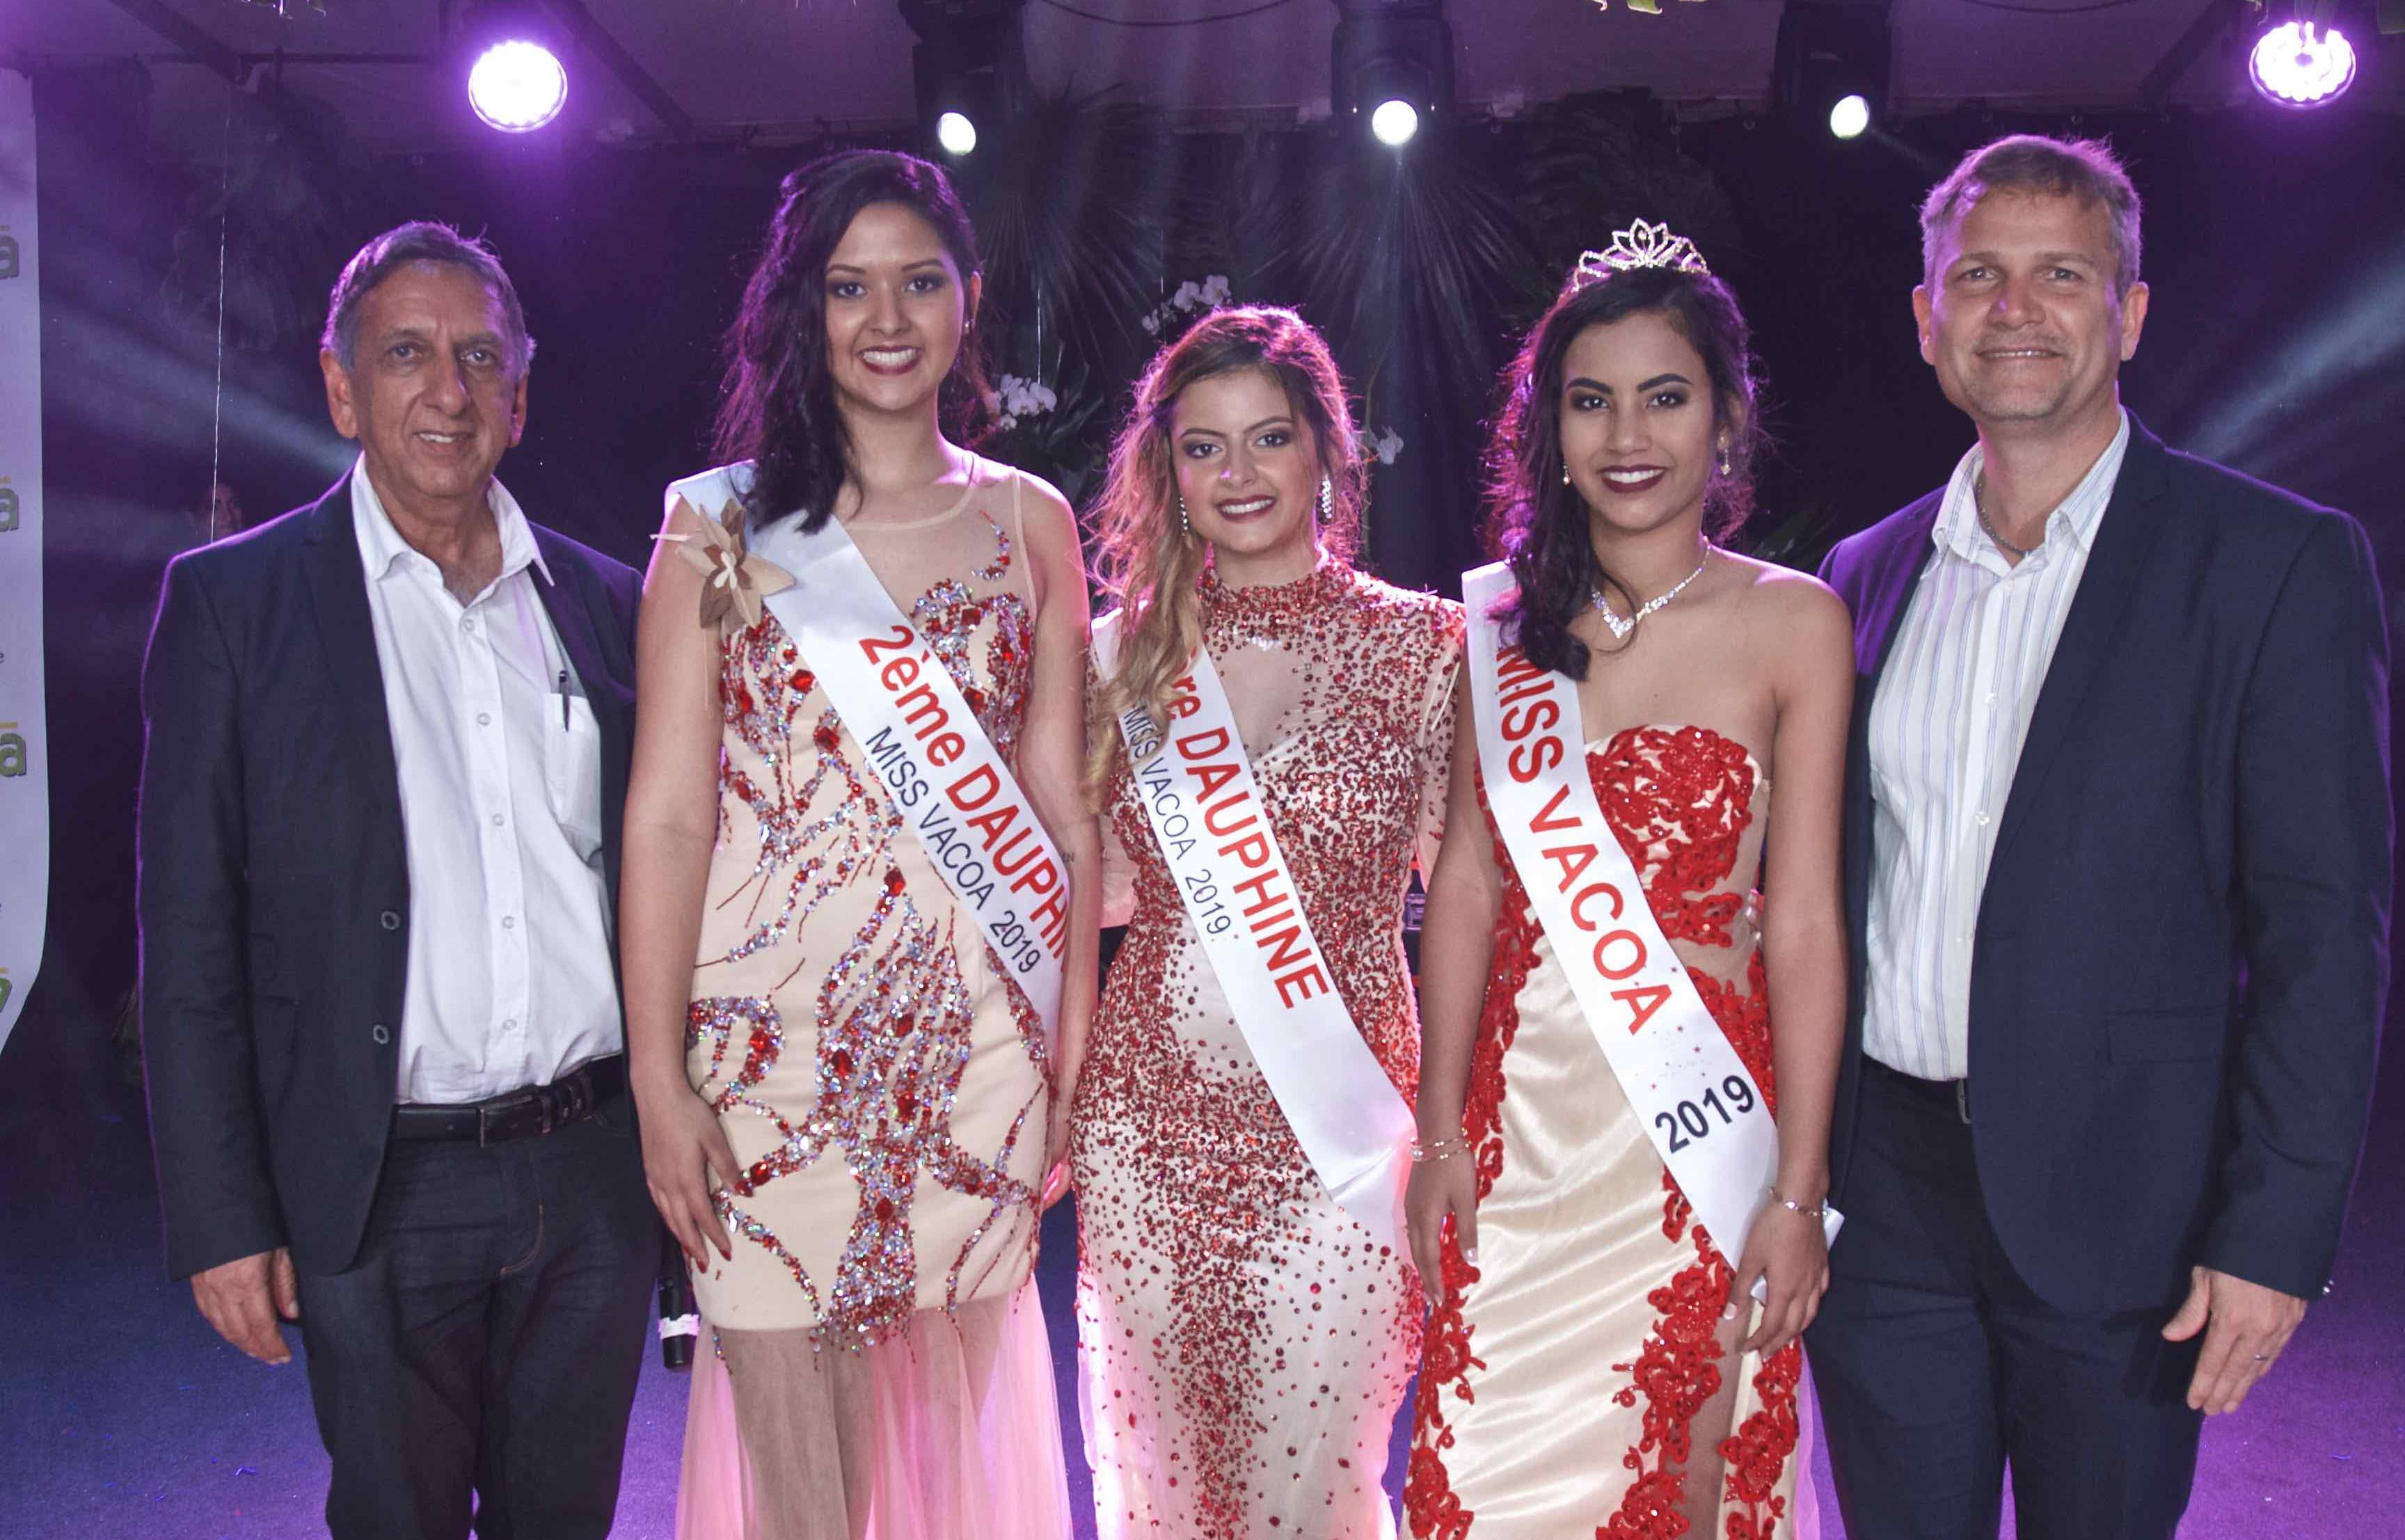 Frideline Mouniama élue Miss Vacoa 2019